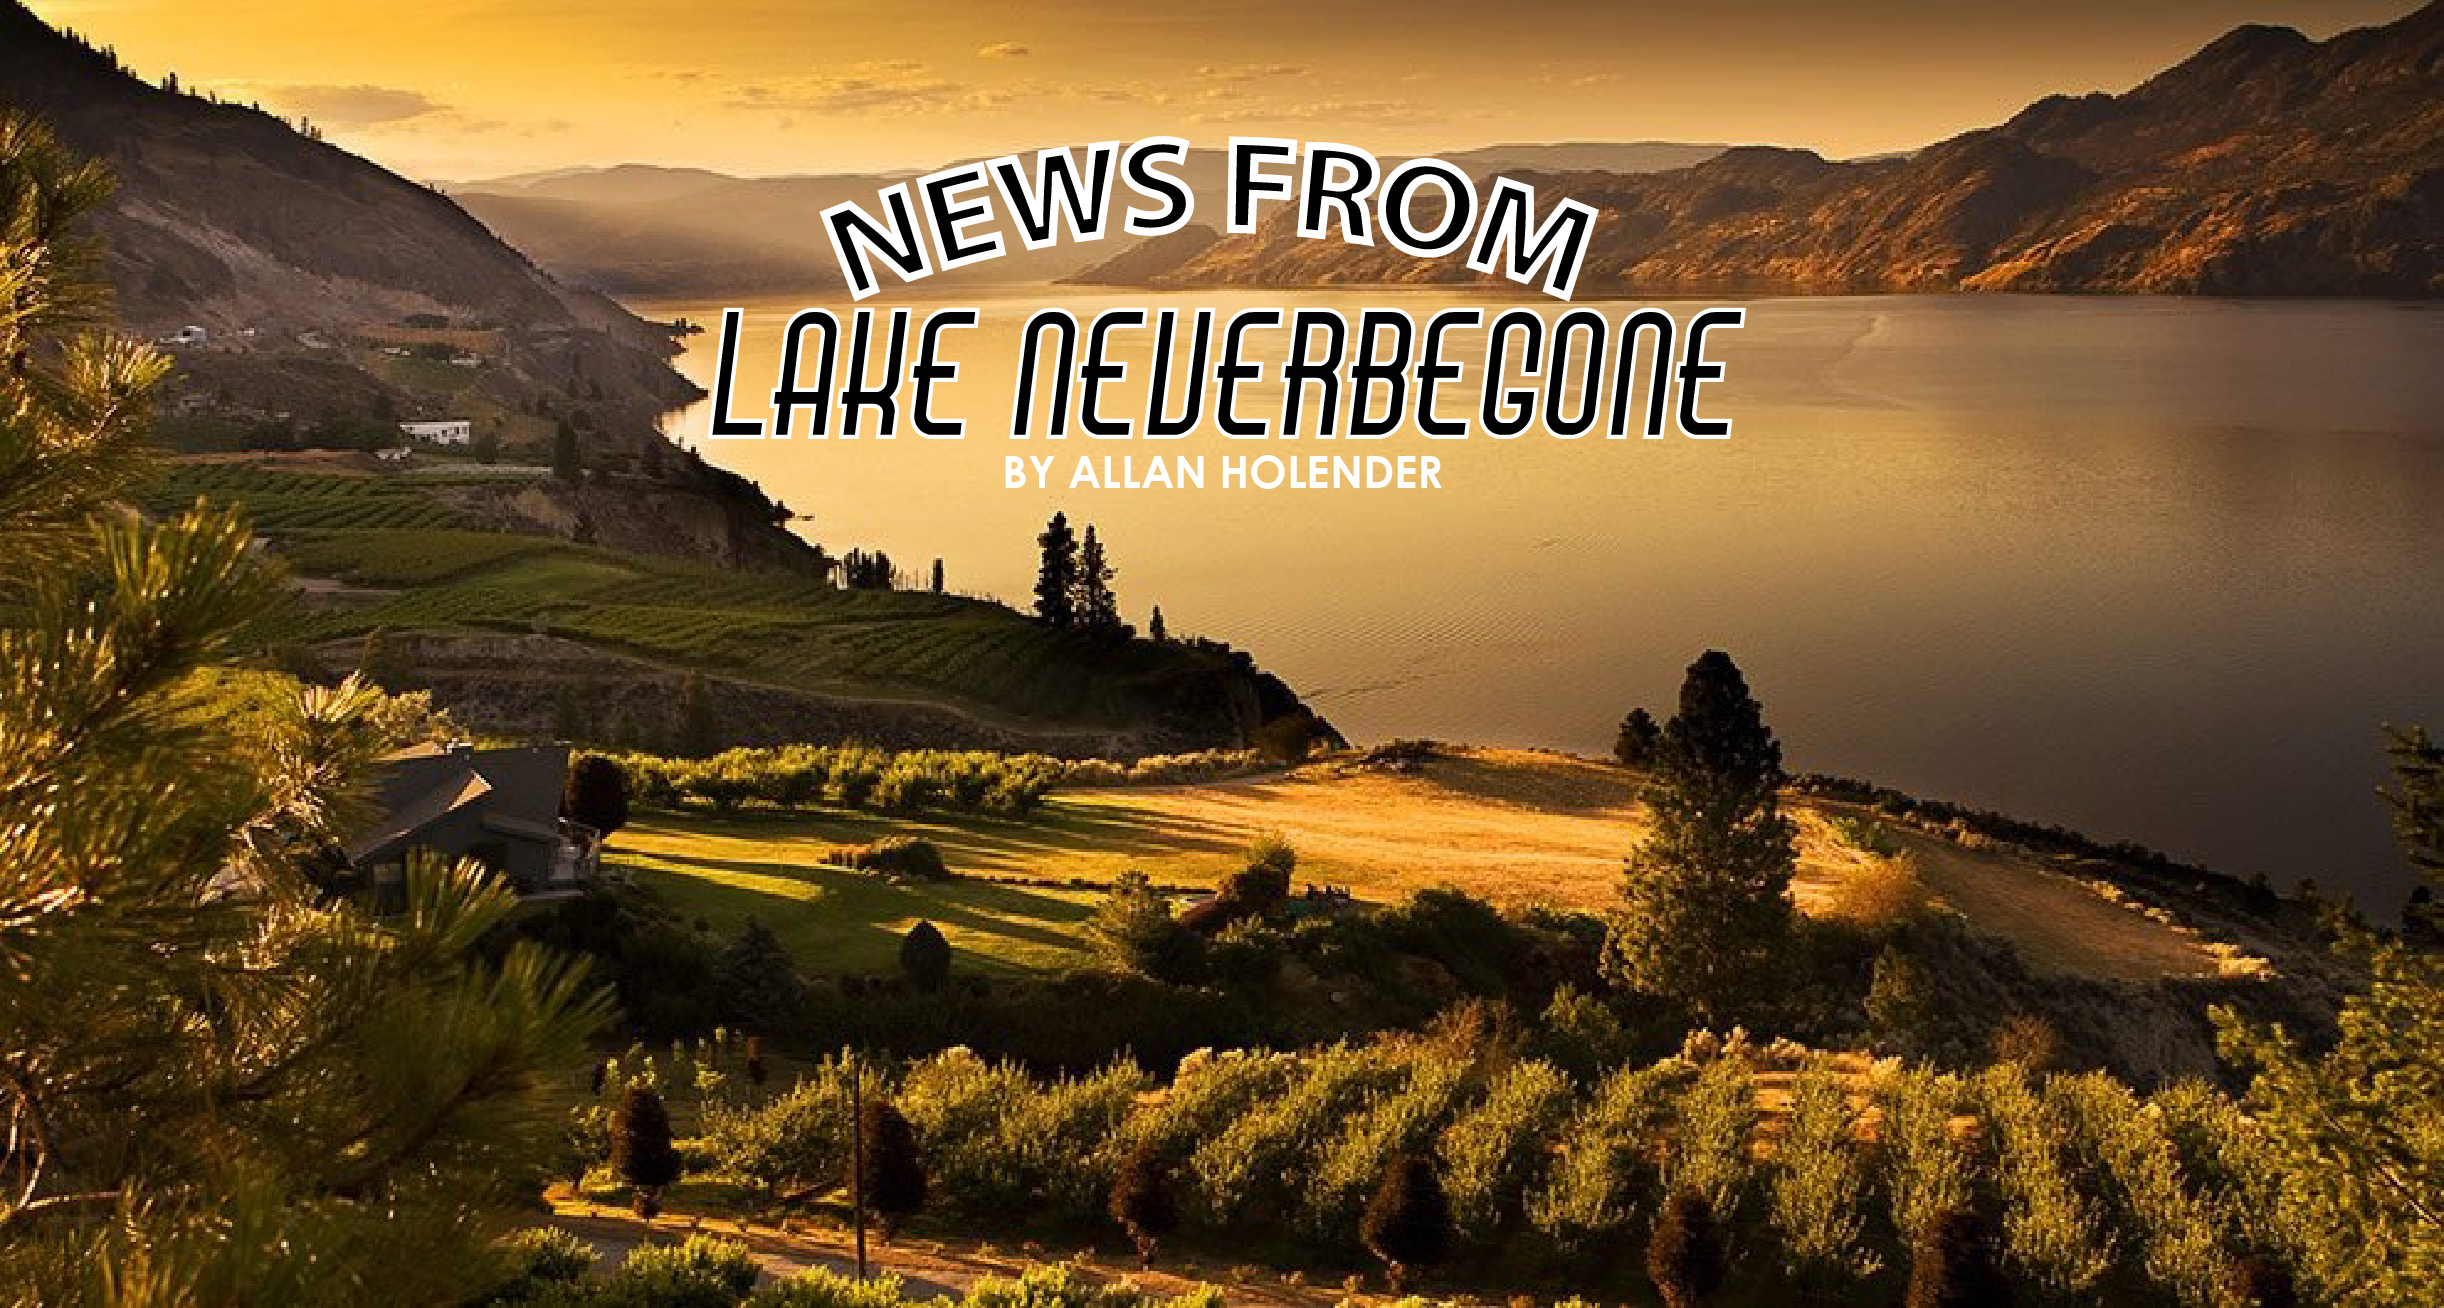 news-from-lake-neverbegone-official-logo